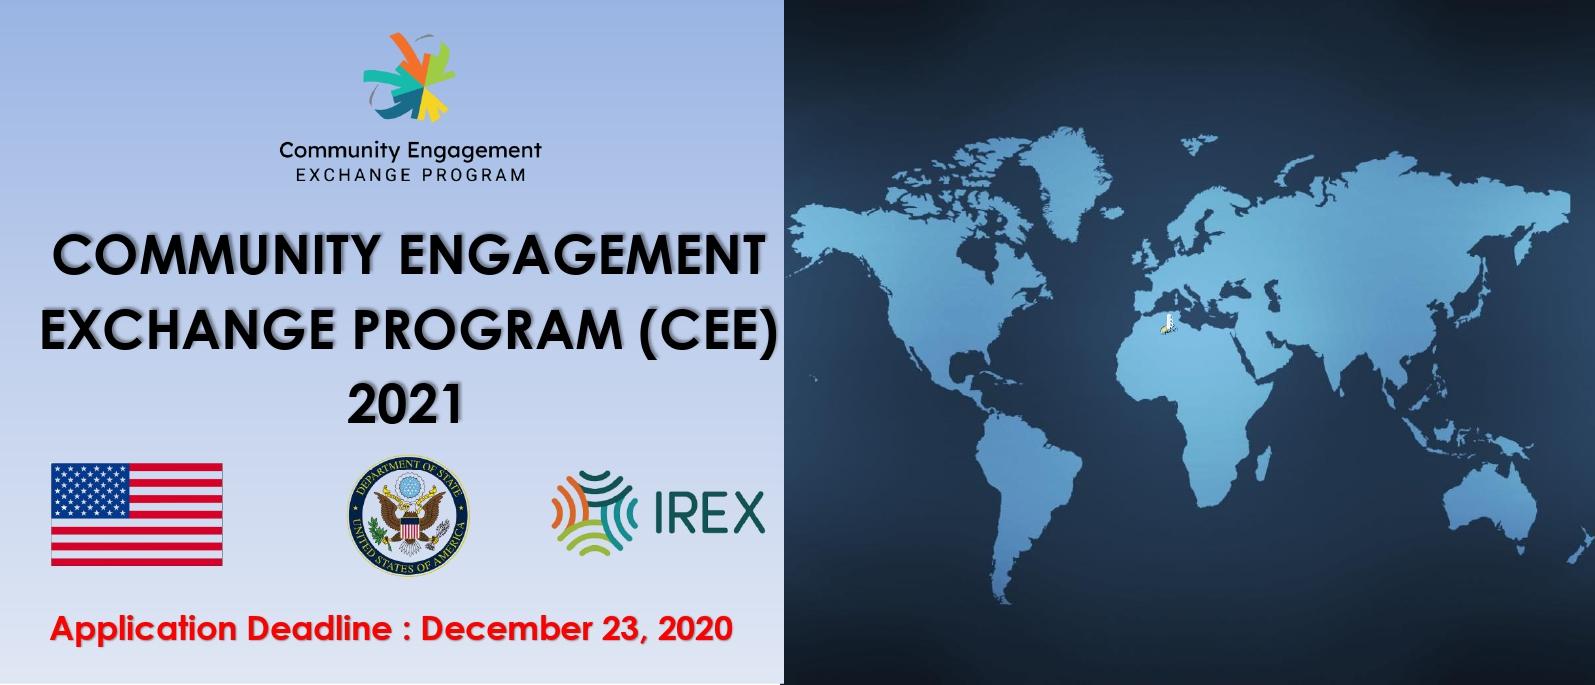 Community Engagement Exchange